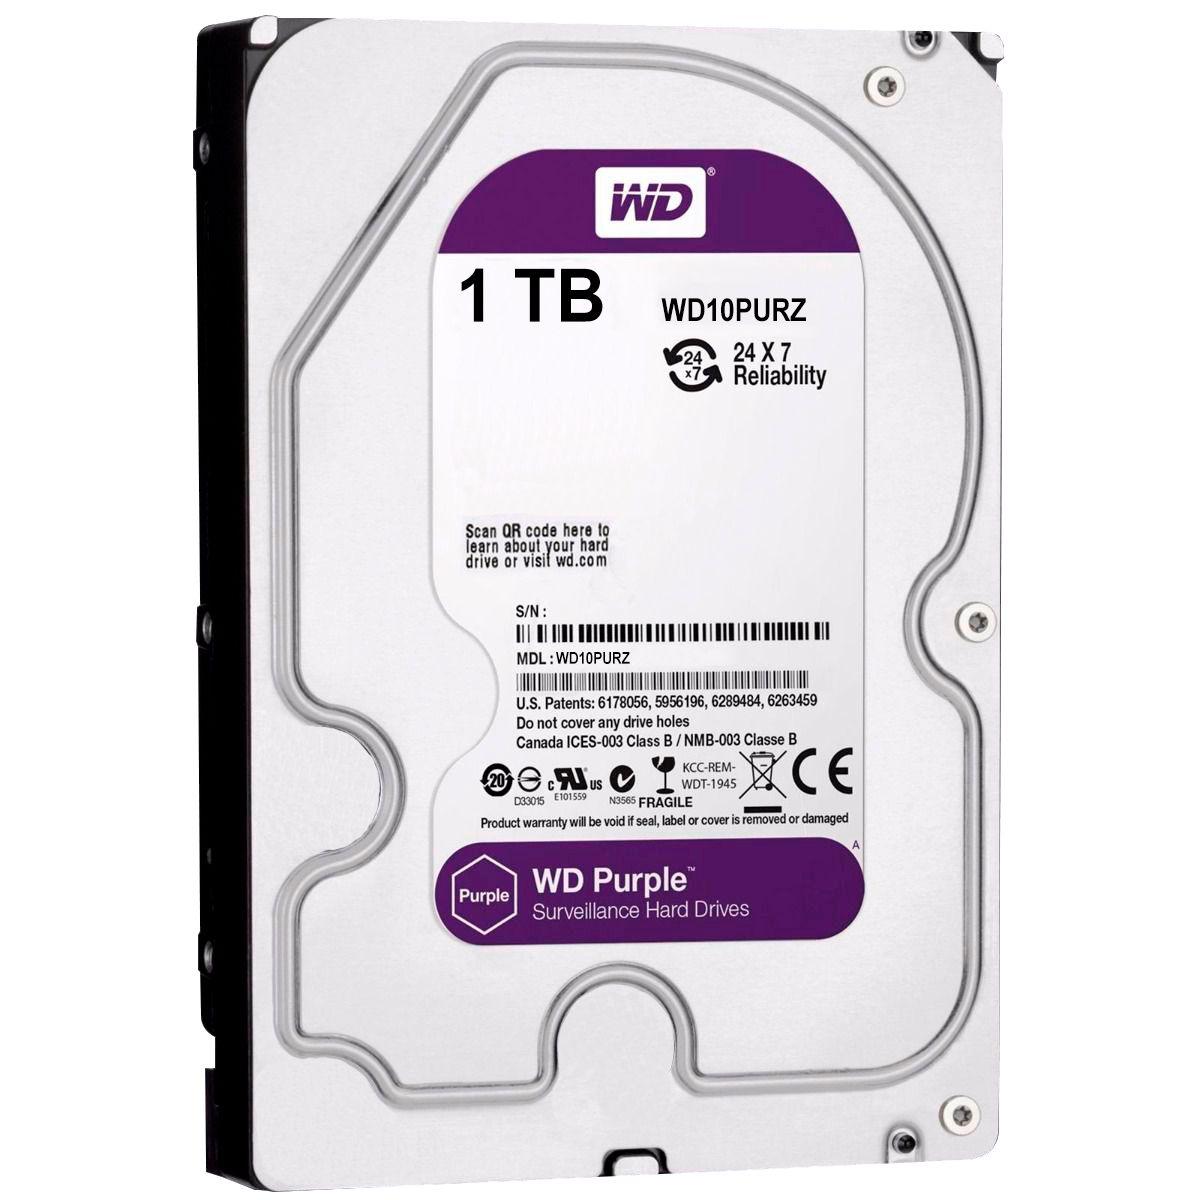 Kit Intelbras 6 Câmeras HD 720p VMH 3130 B + DVR Intelbras + HD 1TB WD Purple + Acessórios  - Tudo Forte